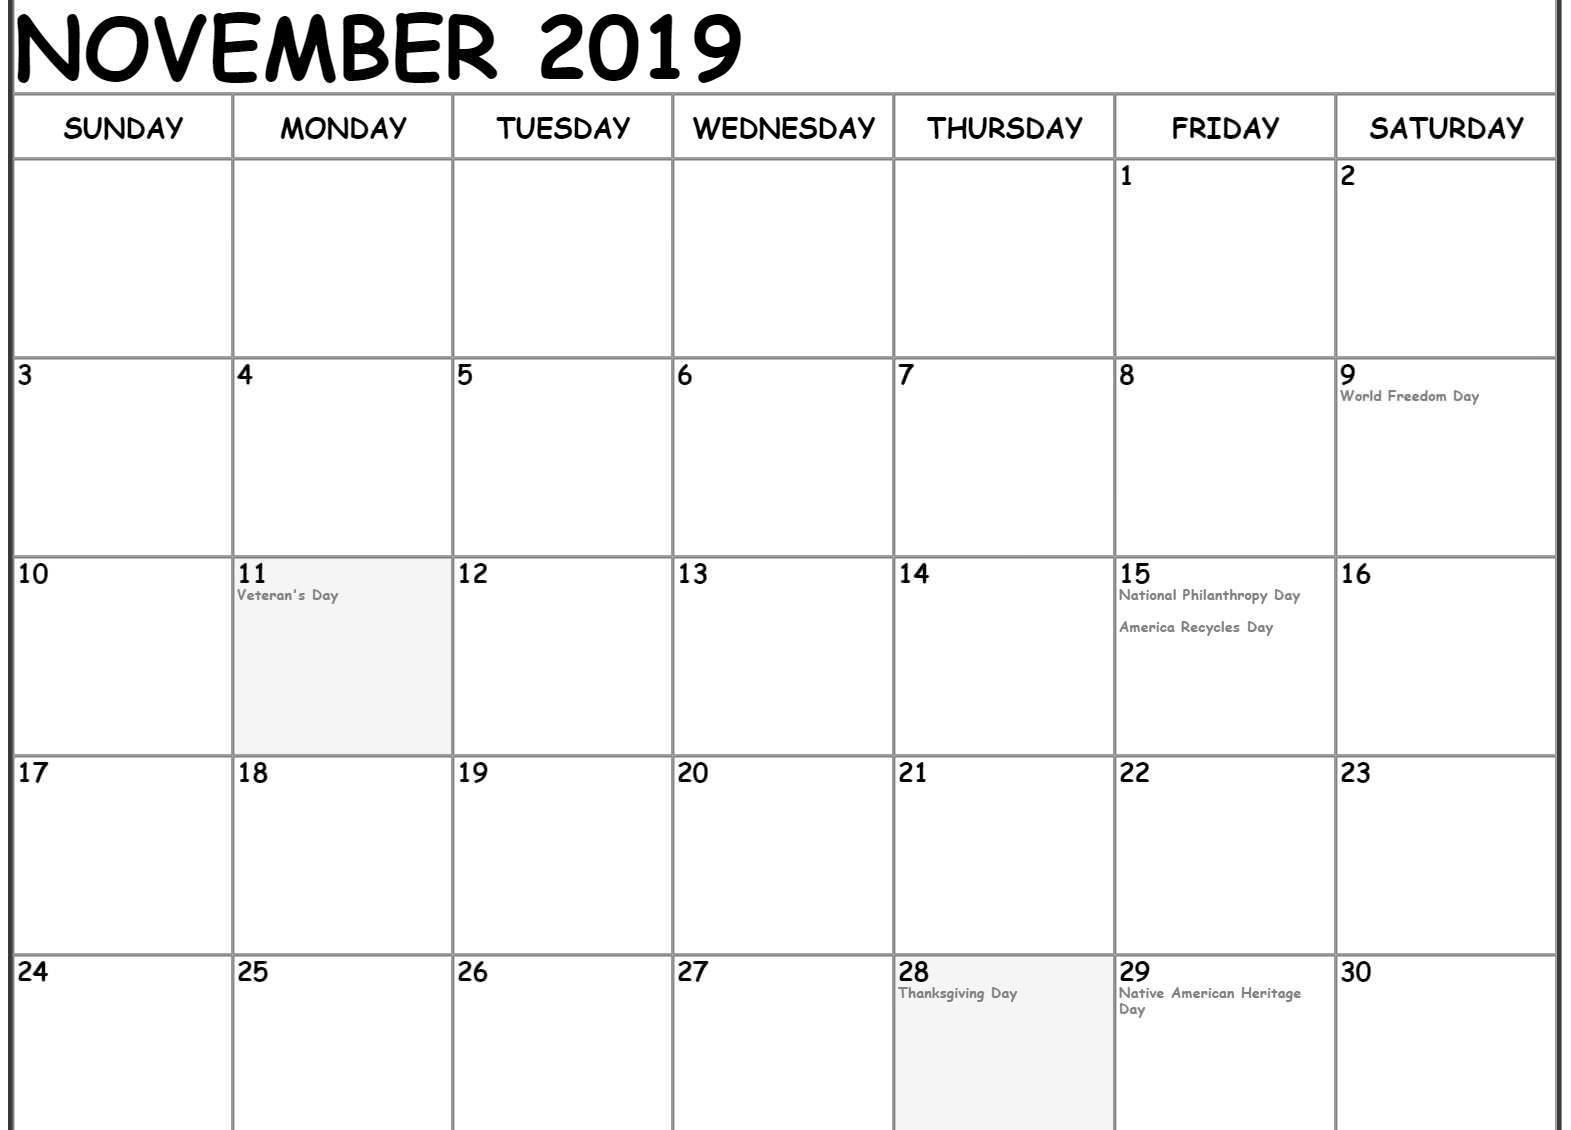 November 2019 Holidays Calendar